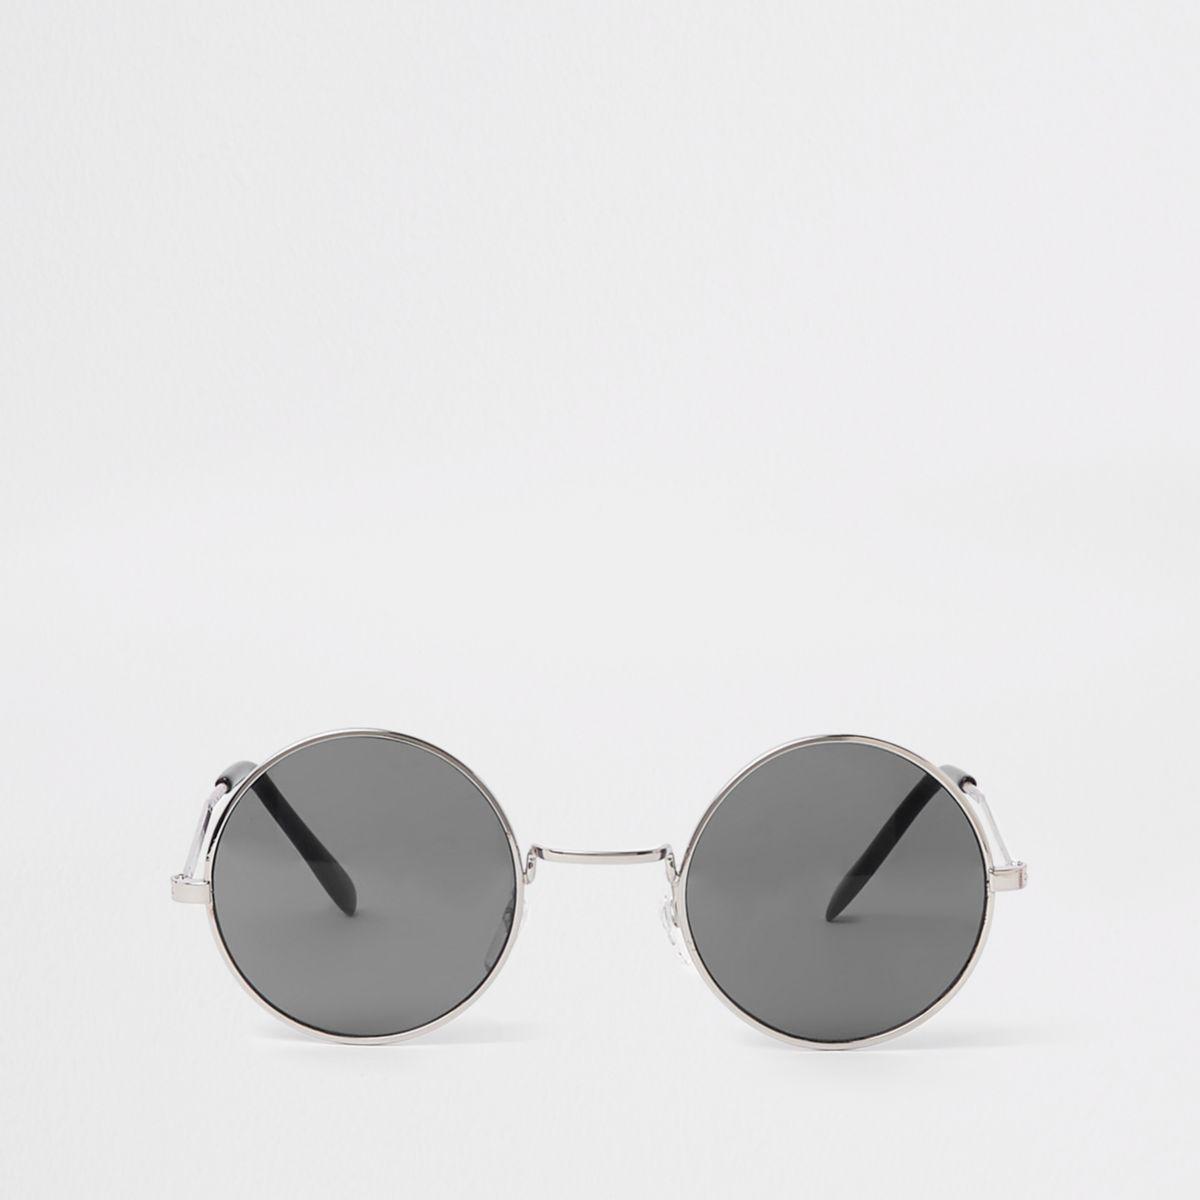 Silver tone black lens sunglasses